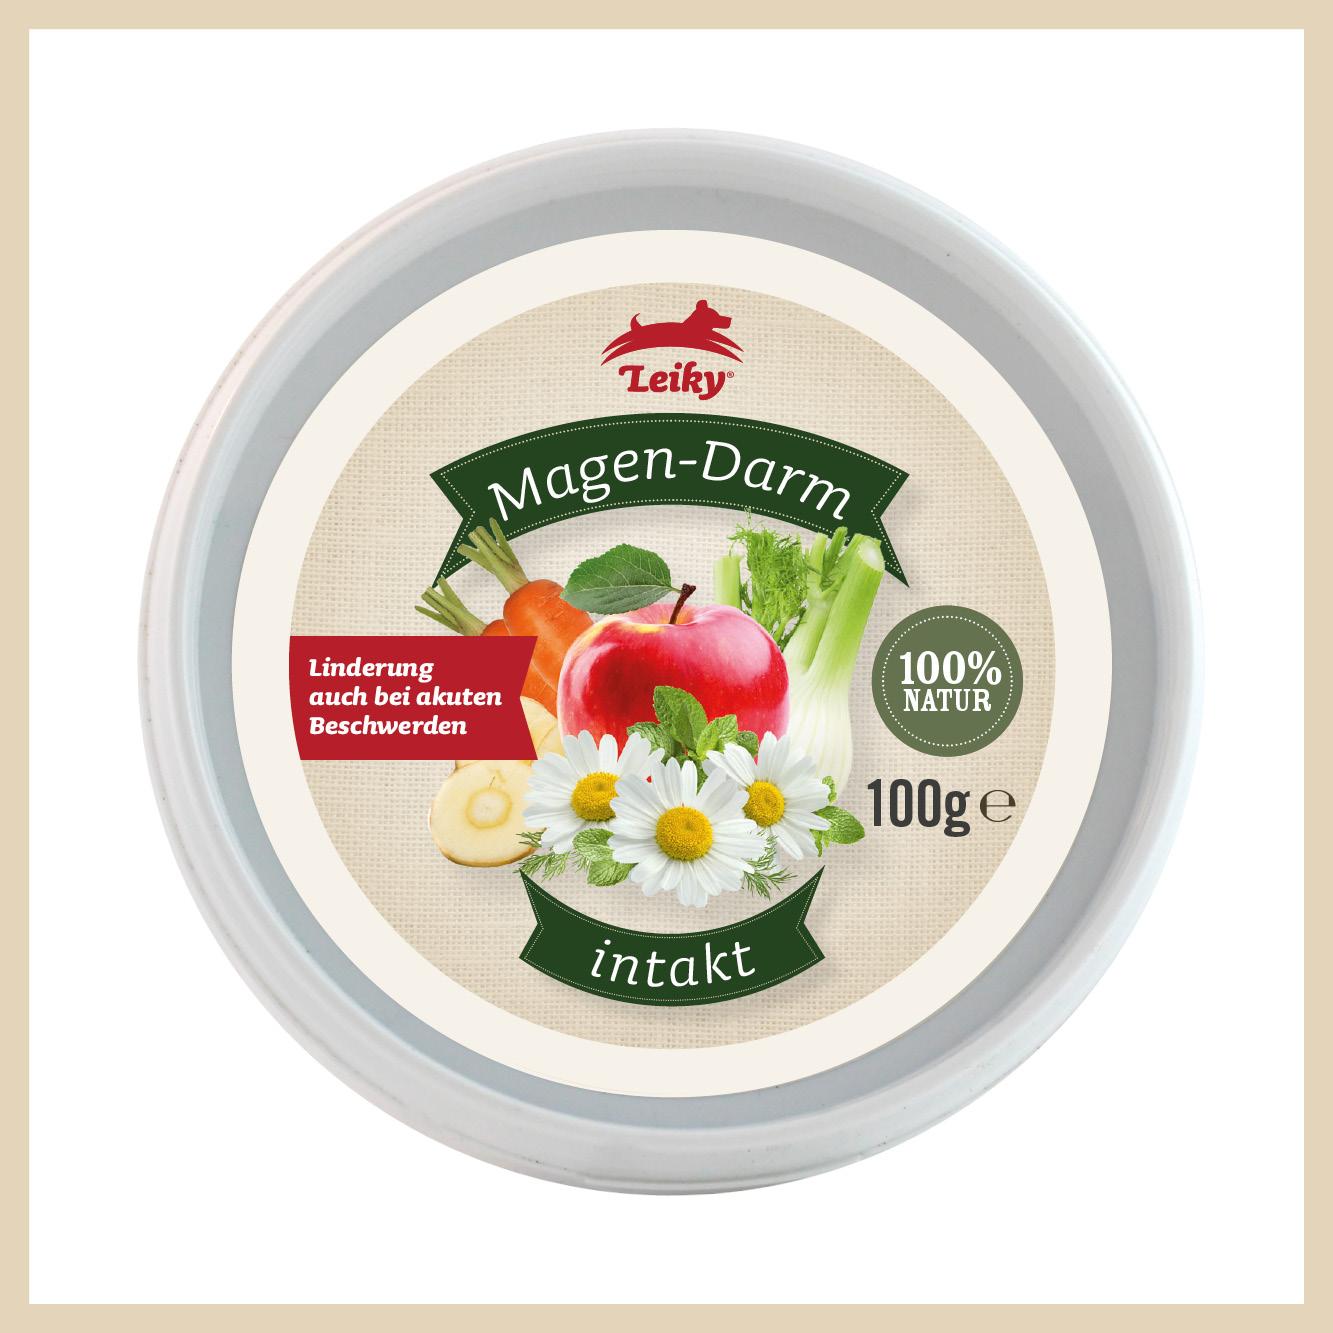 Produktbilder_Magen-Darm-Intakt